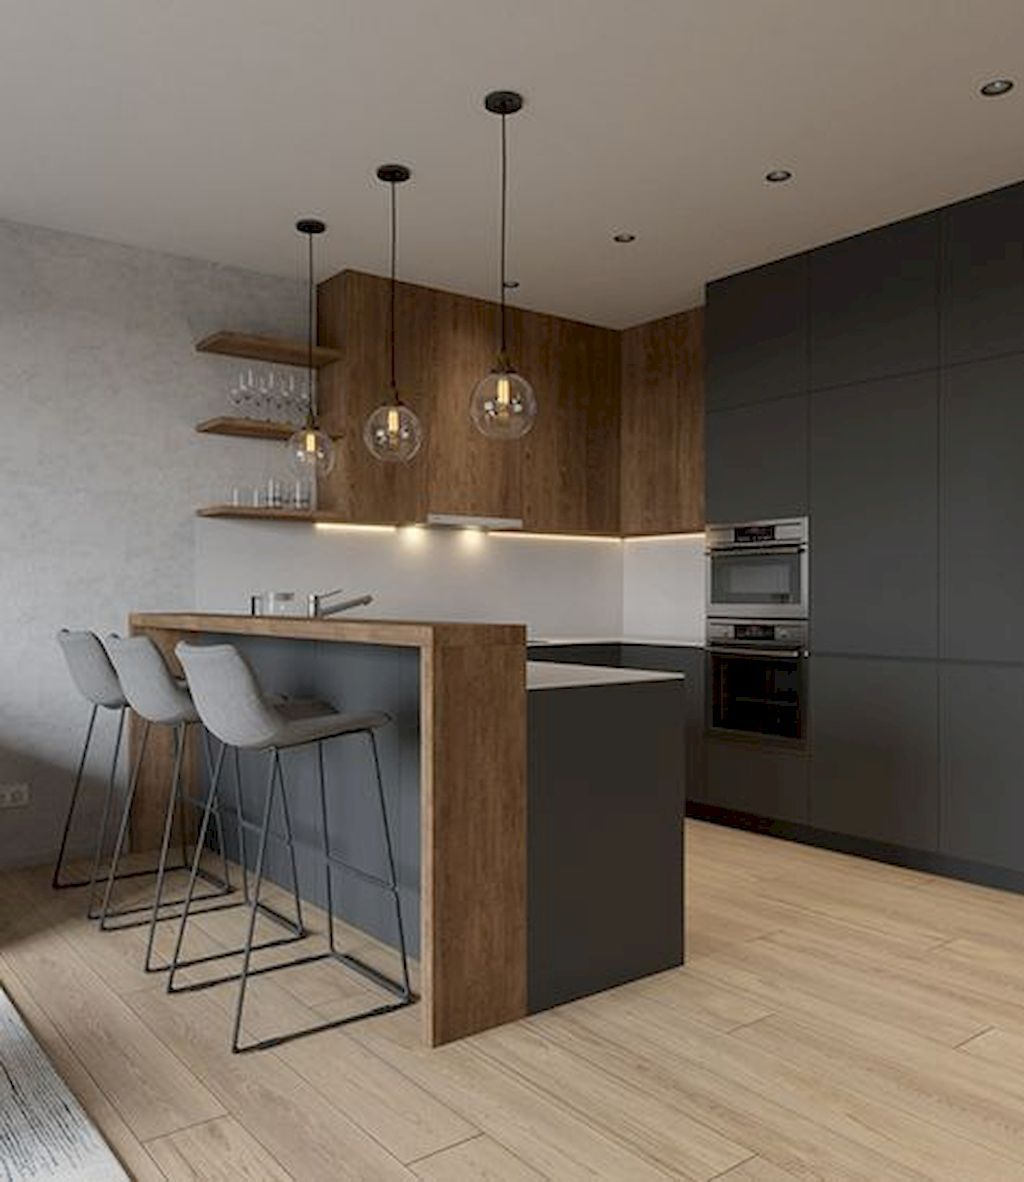 Popular Minimalist Kitchen Design Ideas You Never Seen Before 19